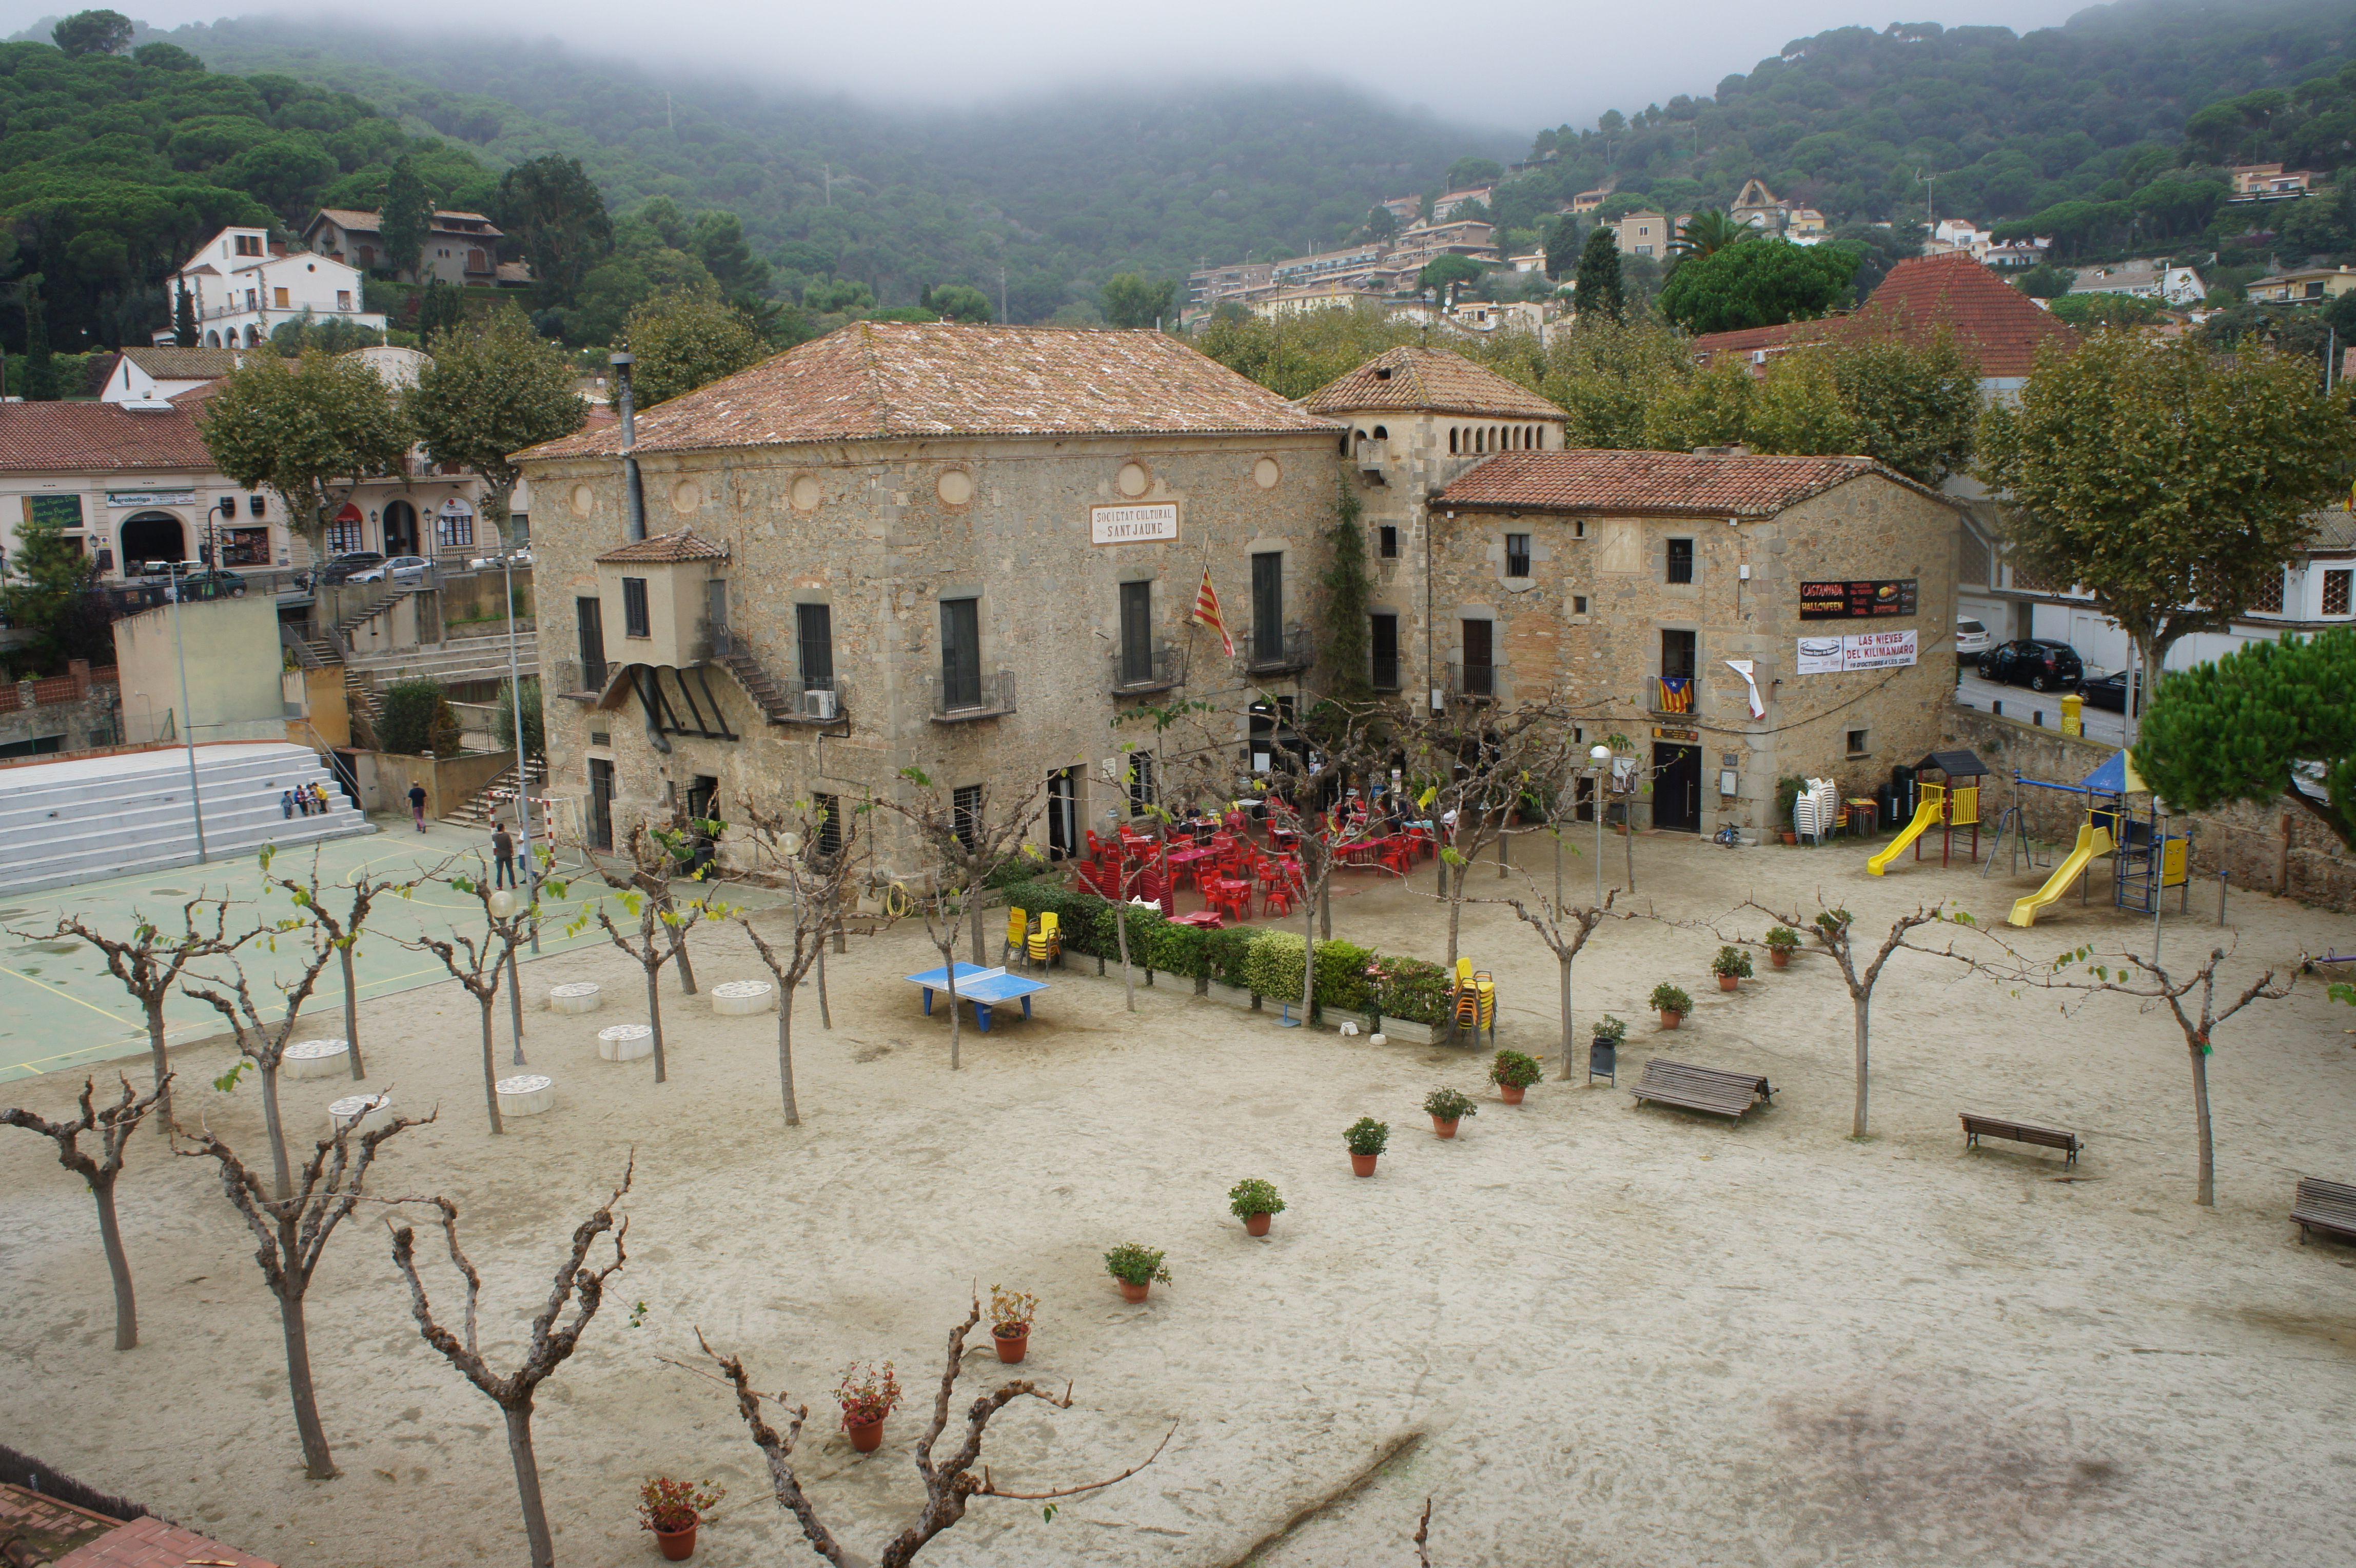 Societat Cultural Sant Jaume, Premiá de Dalt http://www.scsantjaume.cat/